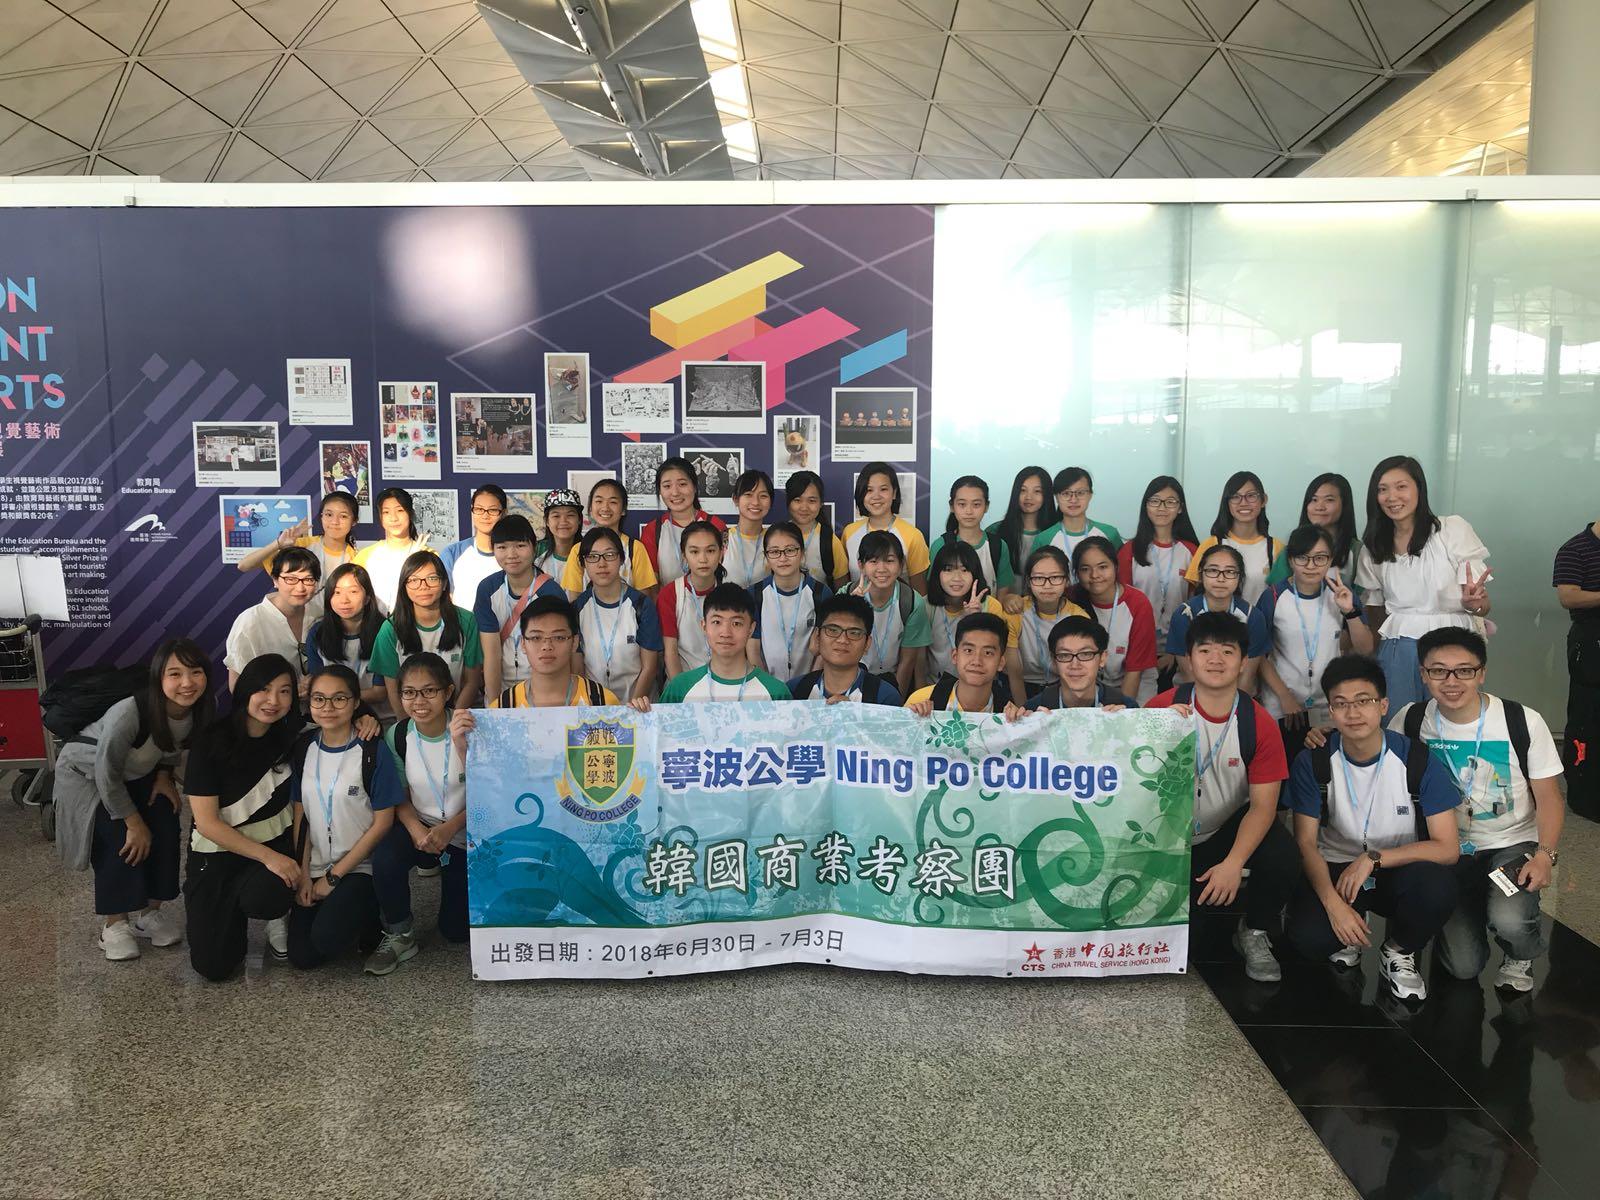 http://www.npc.edu.hk/sites/default/files/0a05f52d-2a2d-4314-990c-fc7c81591fe3.jpg